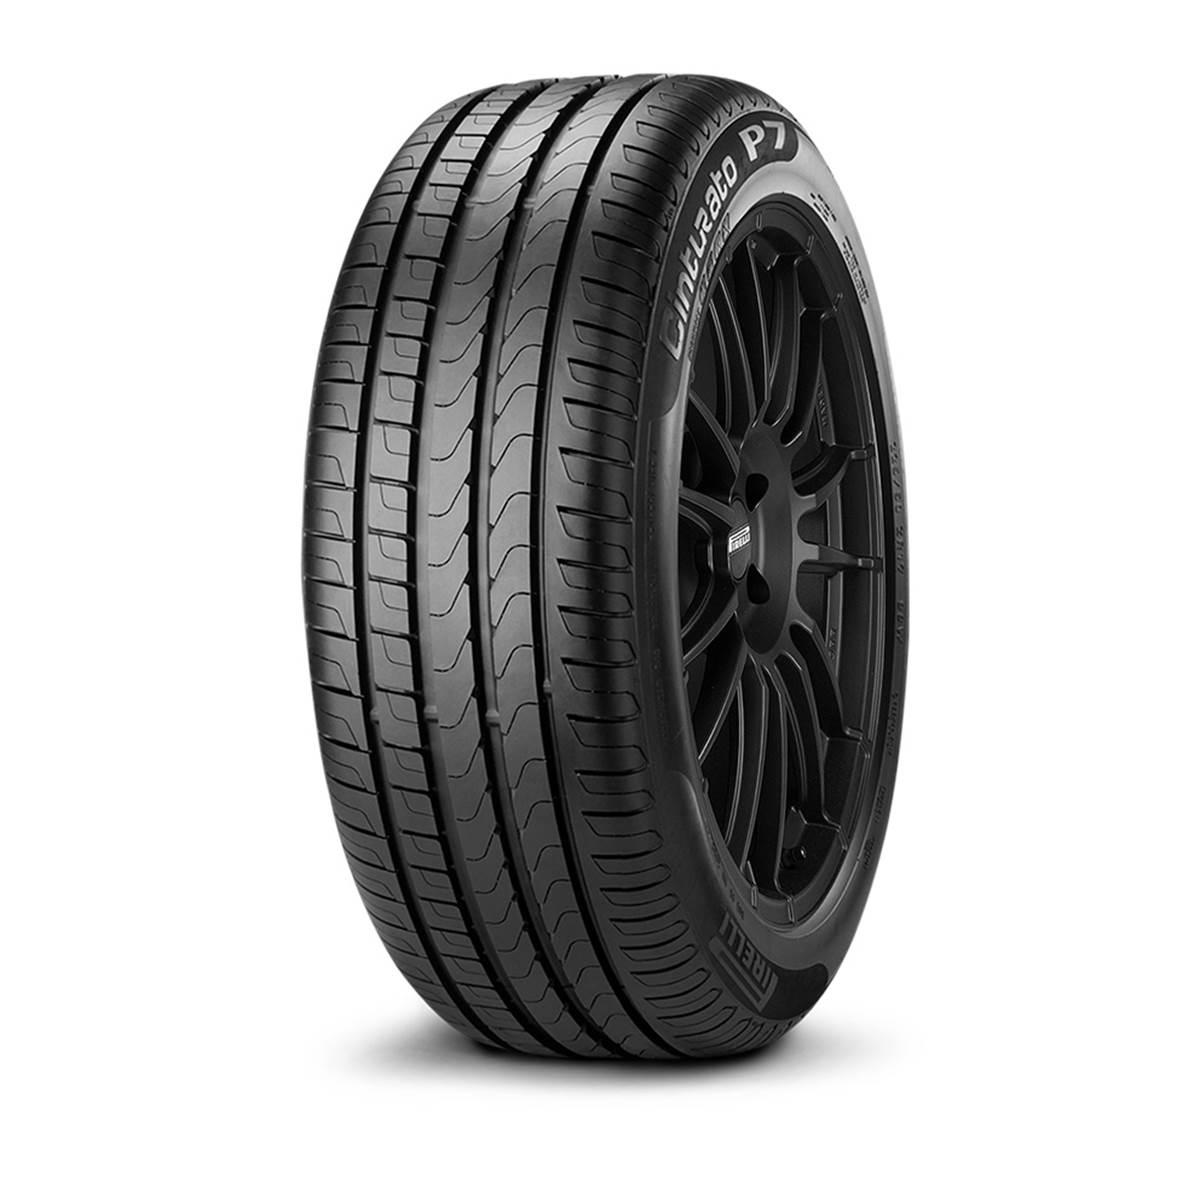 Pneu Pirelli 225/45R17 91W Cinturato P7